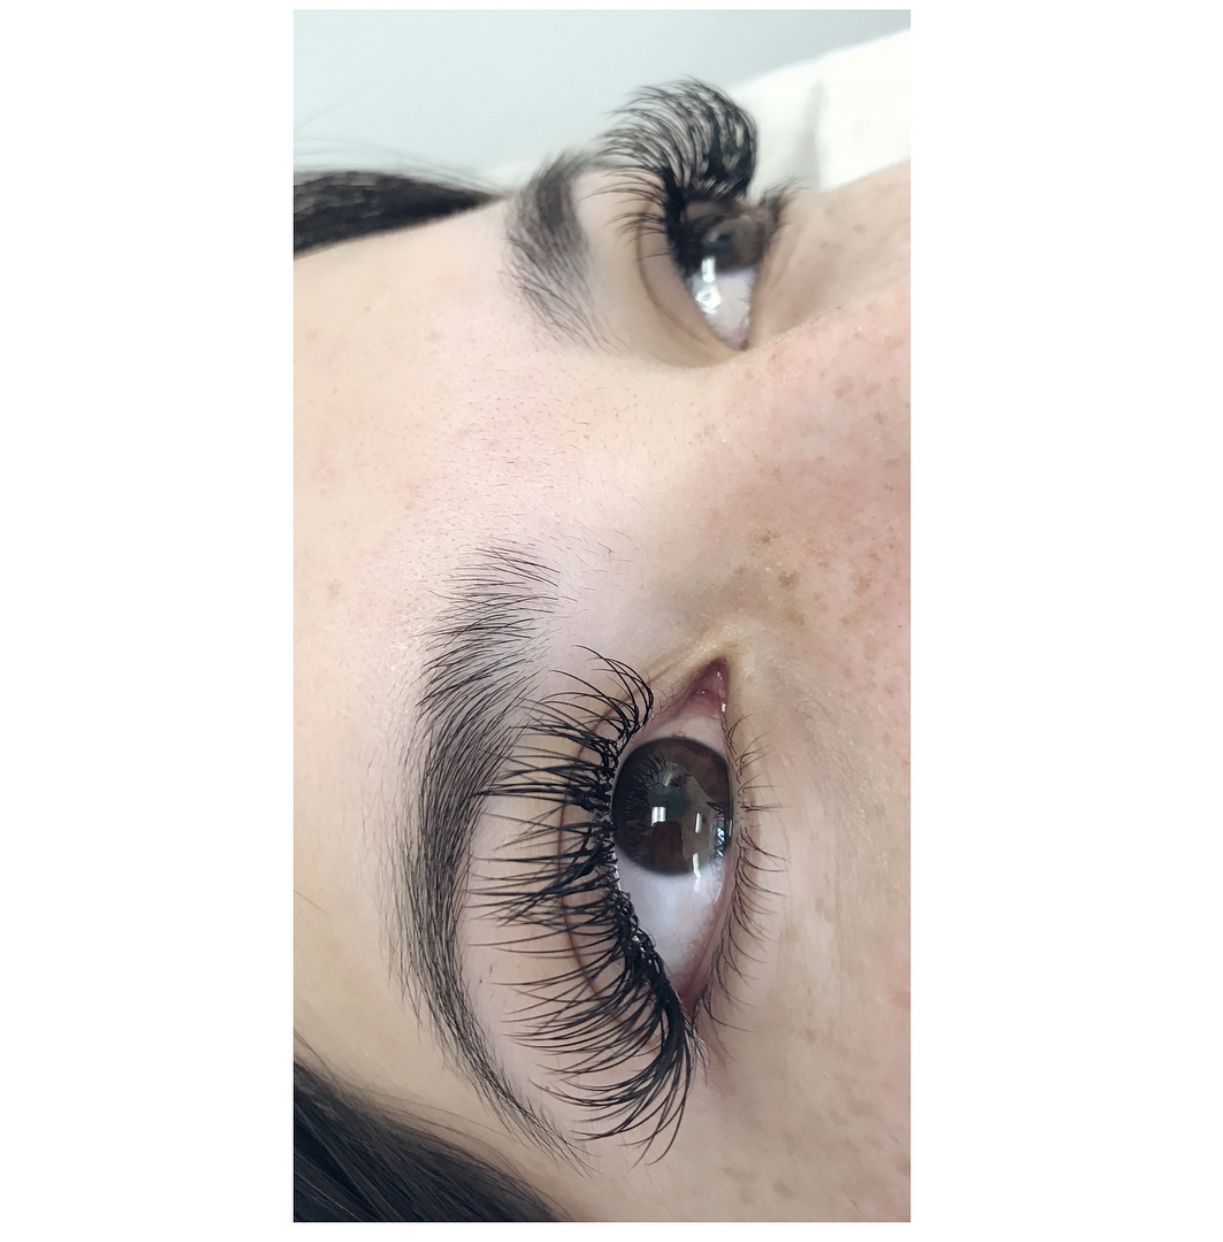 8e62977b0b1 D-Curl | 10mm-15mm | .20 thickness #lashextensions #classic #fill #salon  #sanjose